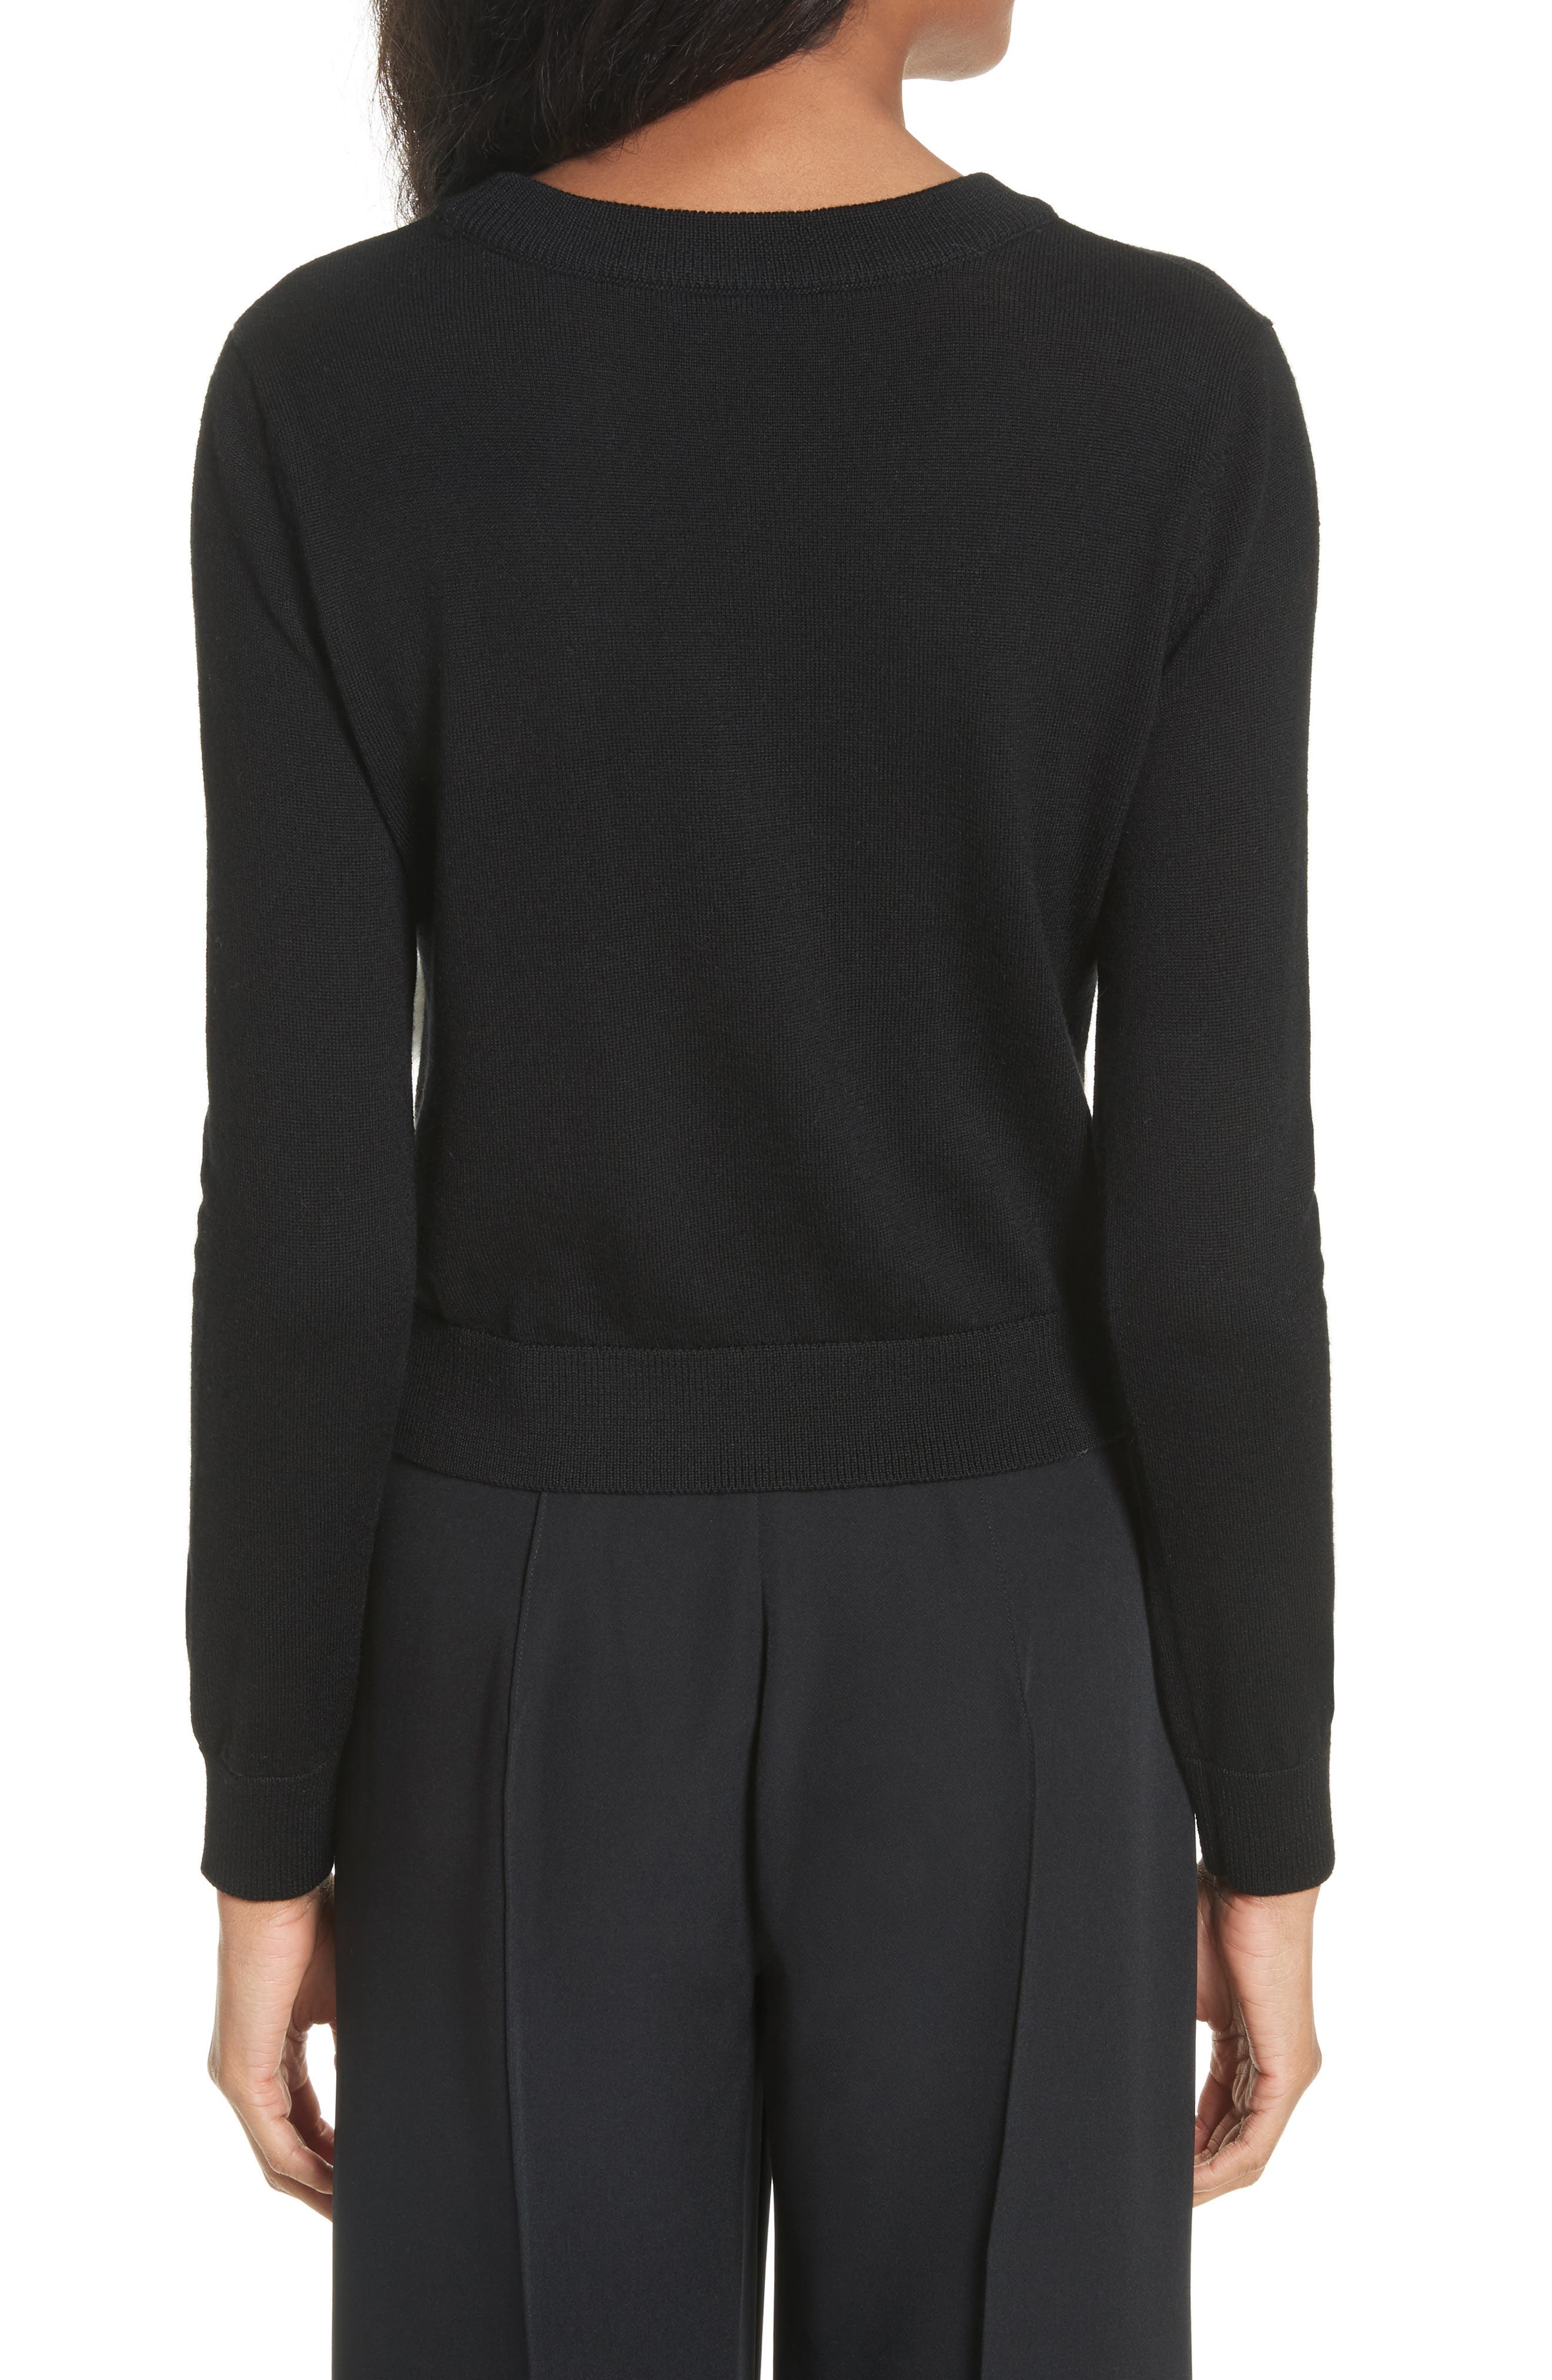 Alternate Image 2  - Milly Beaded Wool Sweater with Genuine Rabbit Fur Trim